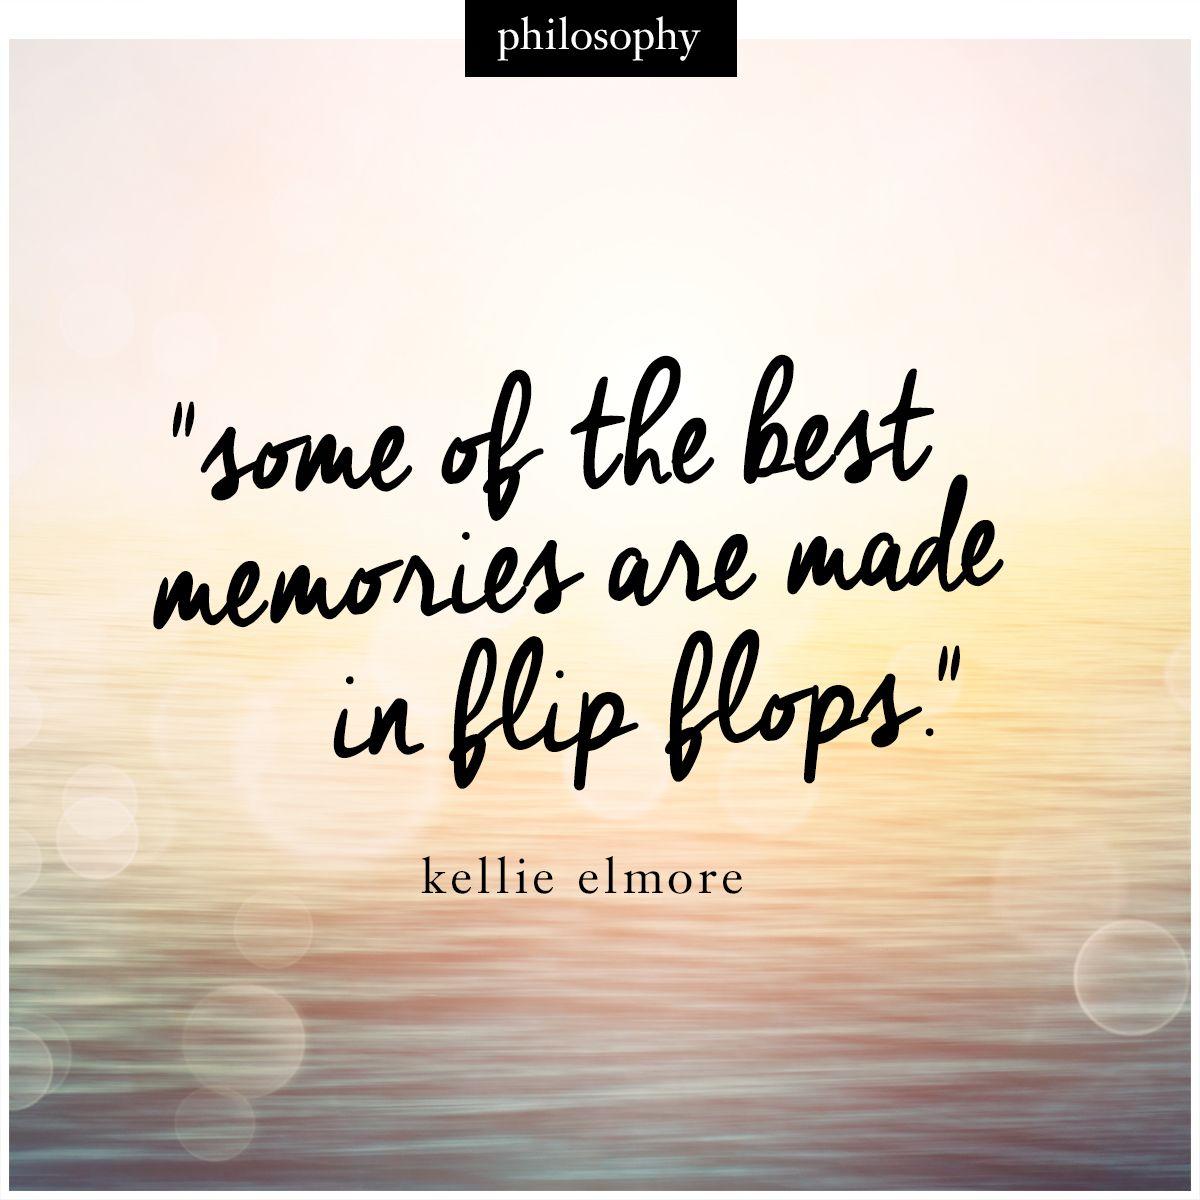 Summer Flip Flop Quotes Image 04